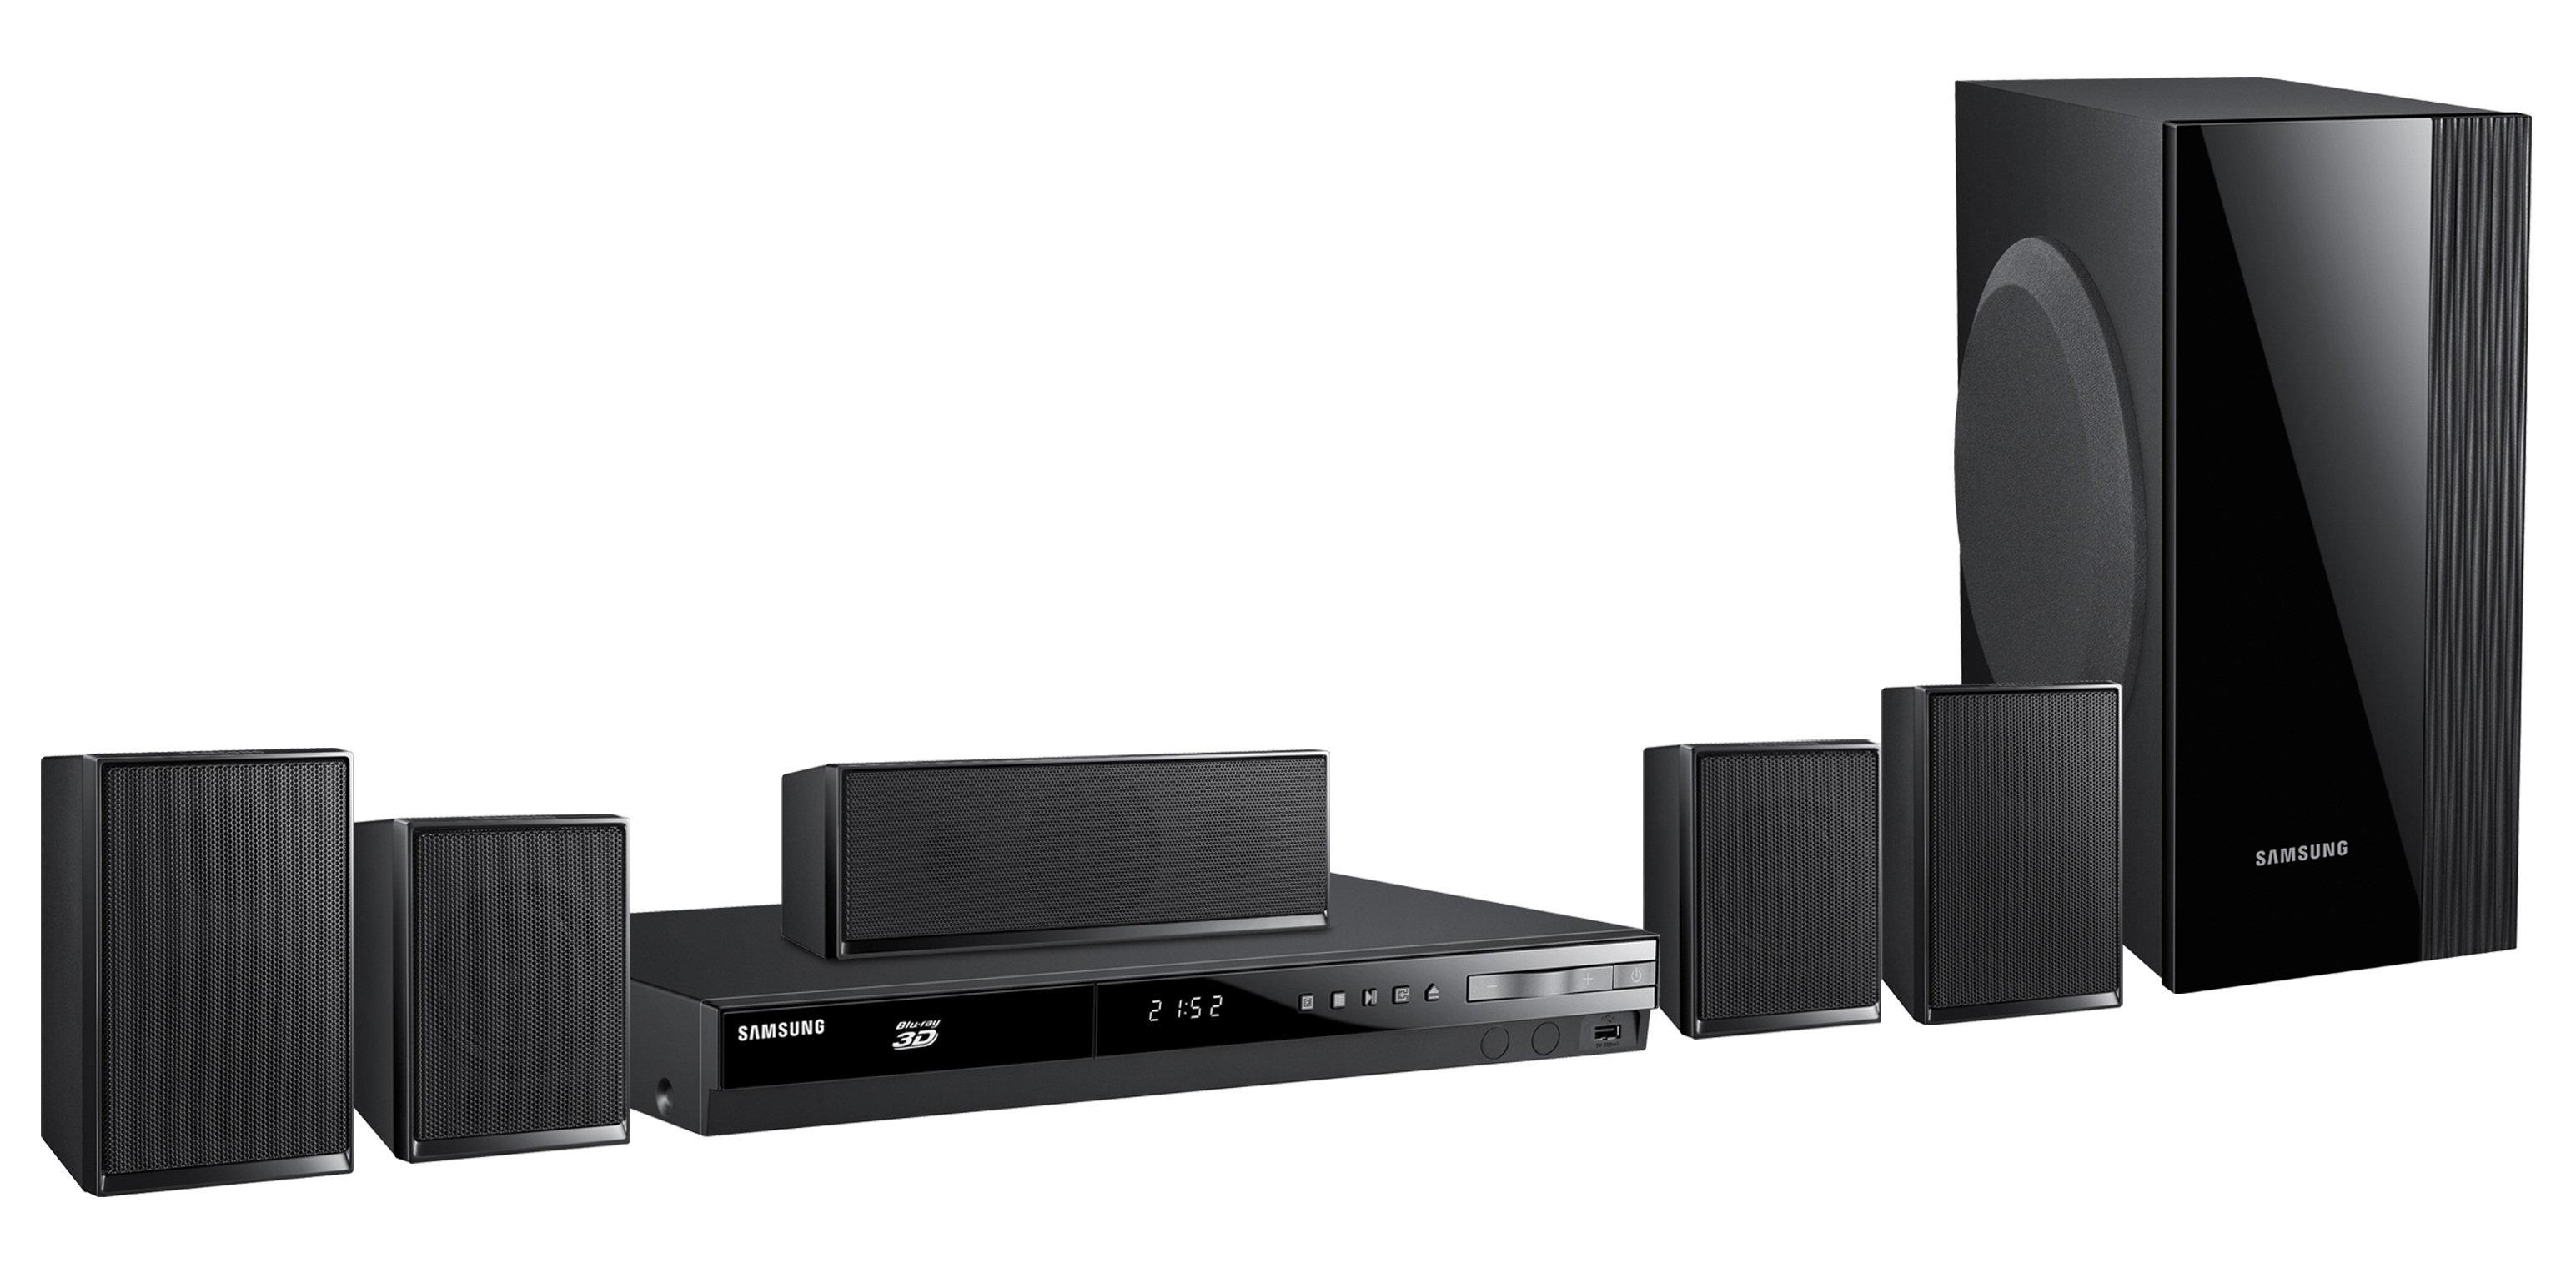 samsung ht e4500 htib 5 1 channel 3d blu ray. Black Bedroom Furniture Sets. Home Design Ideas